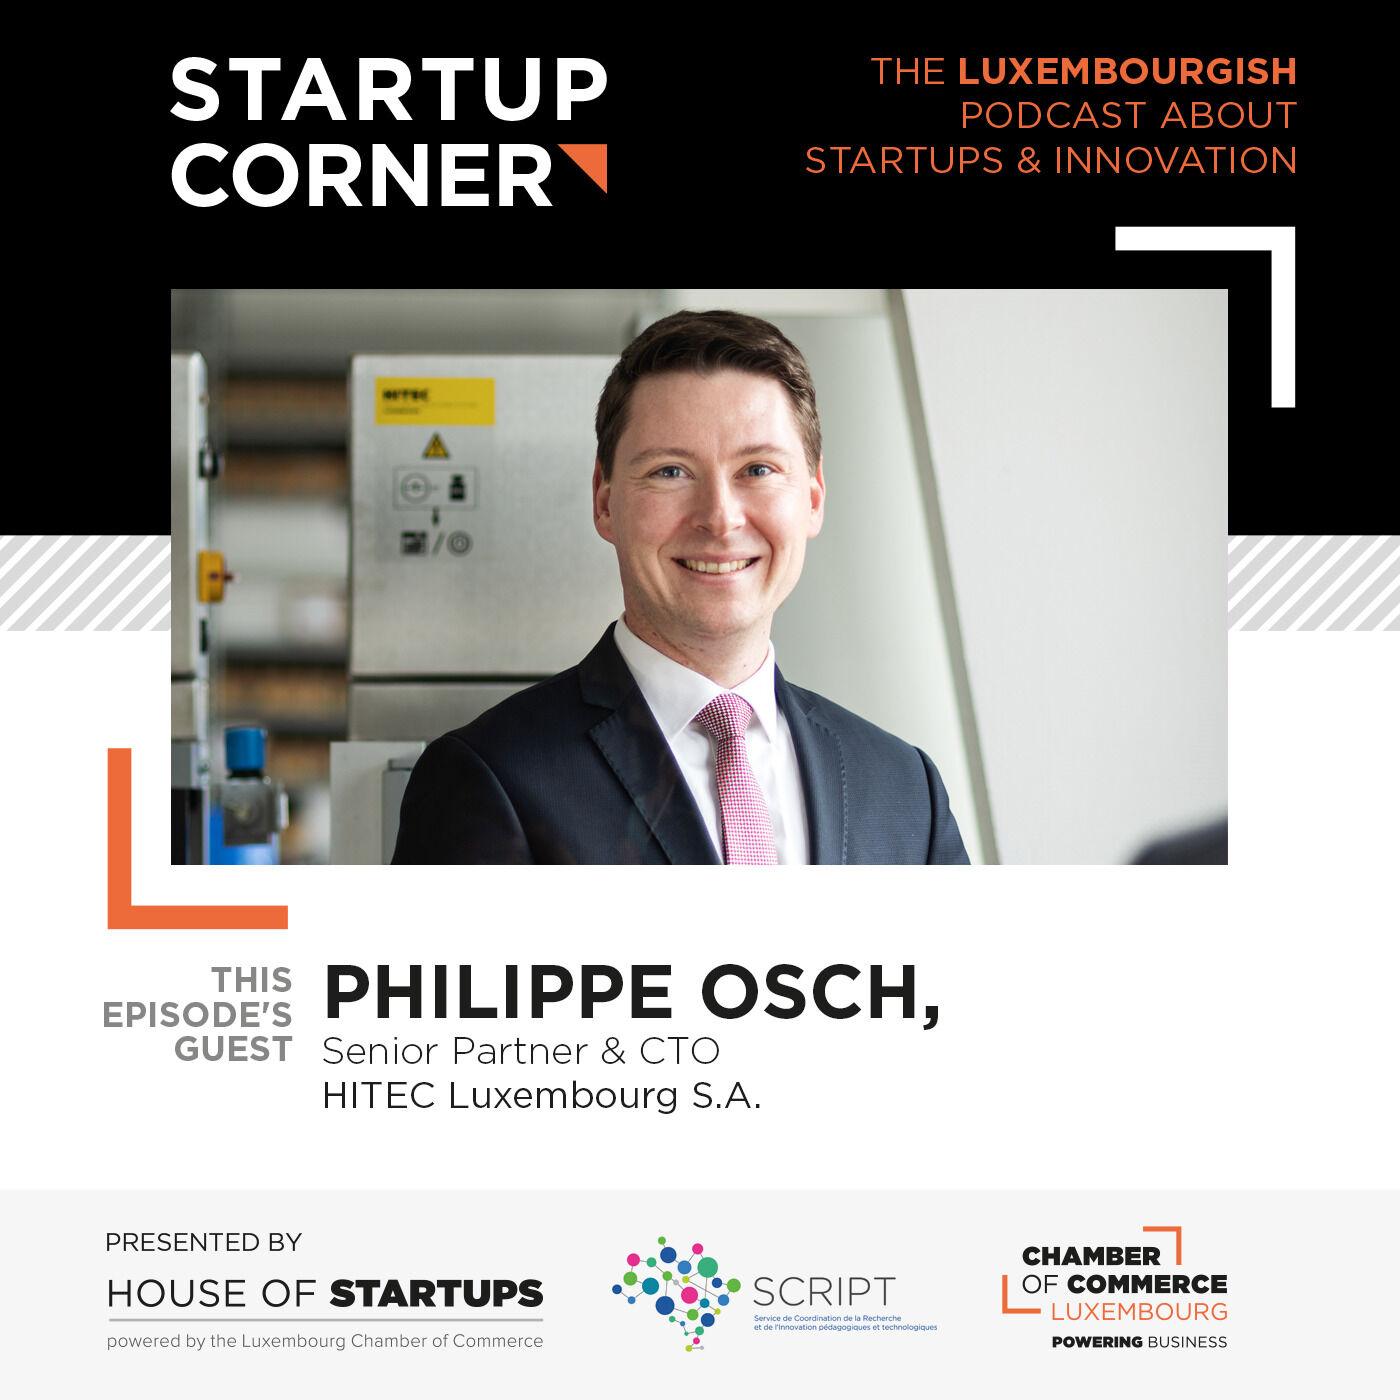 Startup Corner - Philippe Osch - HITEC Luxembourg S.A.